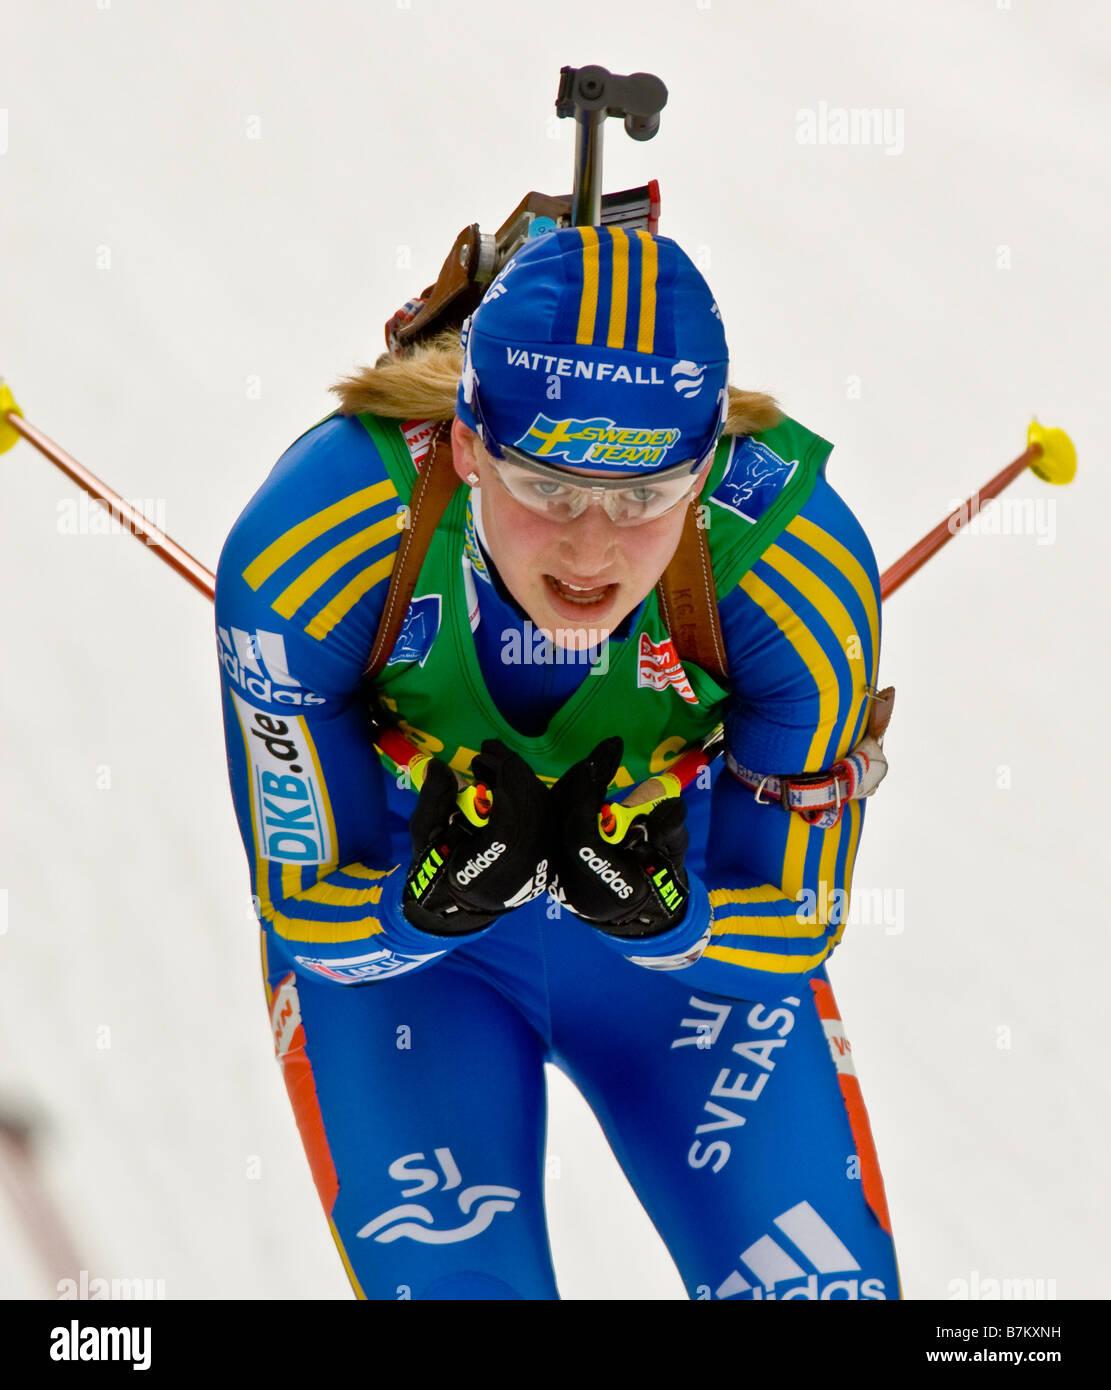 JONSSON Helena Schweden Biathlon Weltcup Verfolgung Frauen M nner Ruhpolding 18 1 2009 - Stock Image